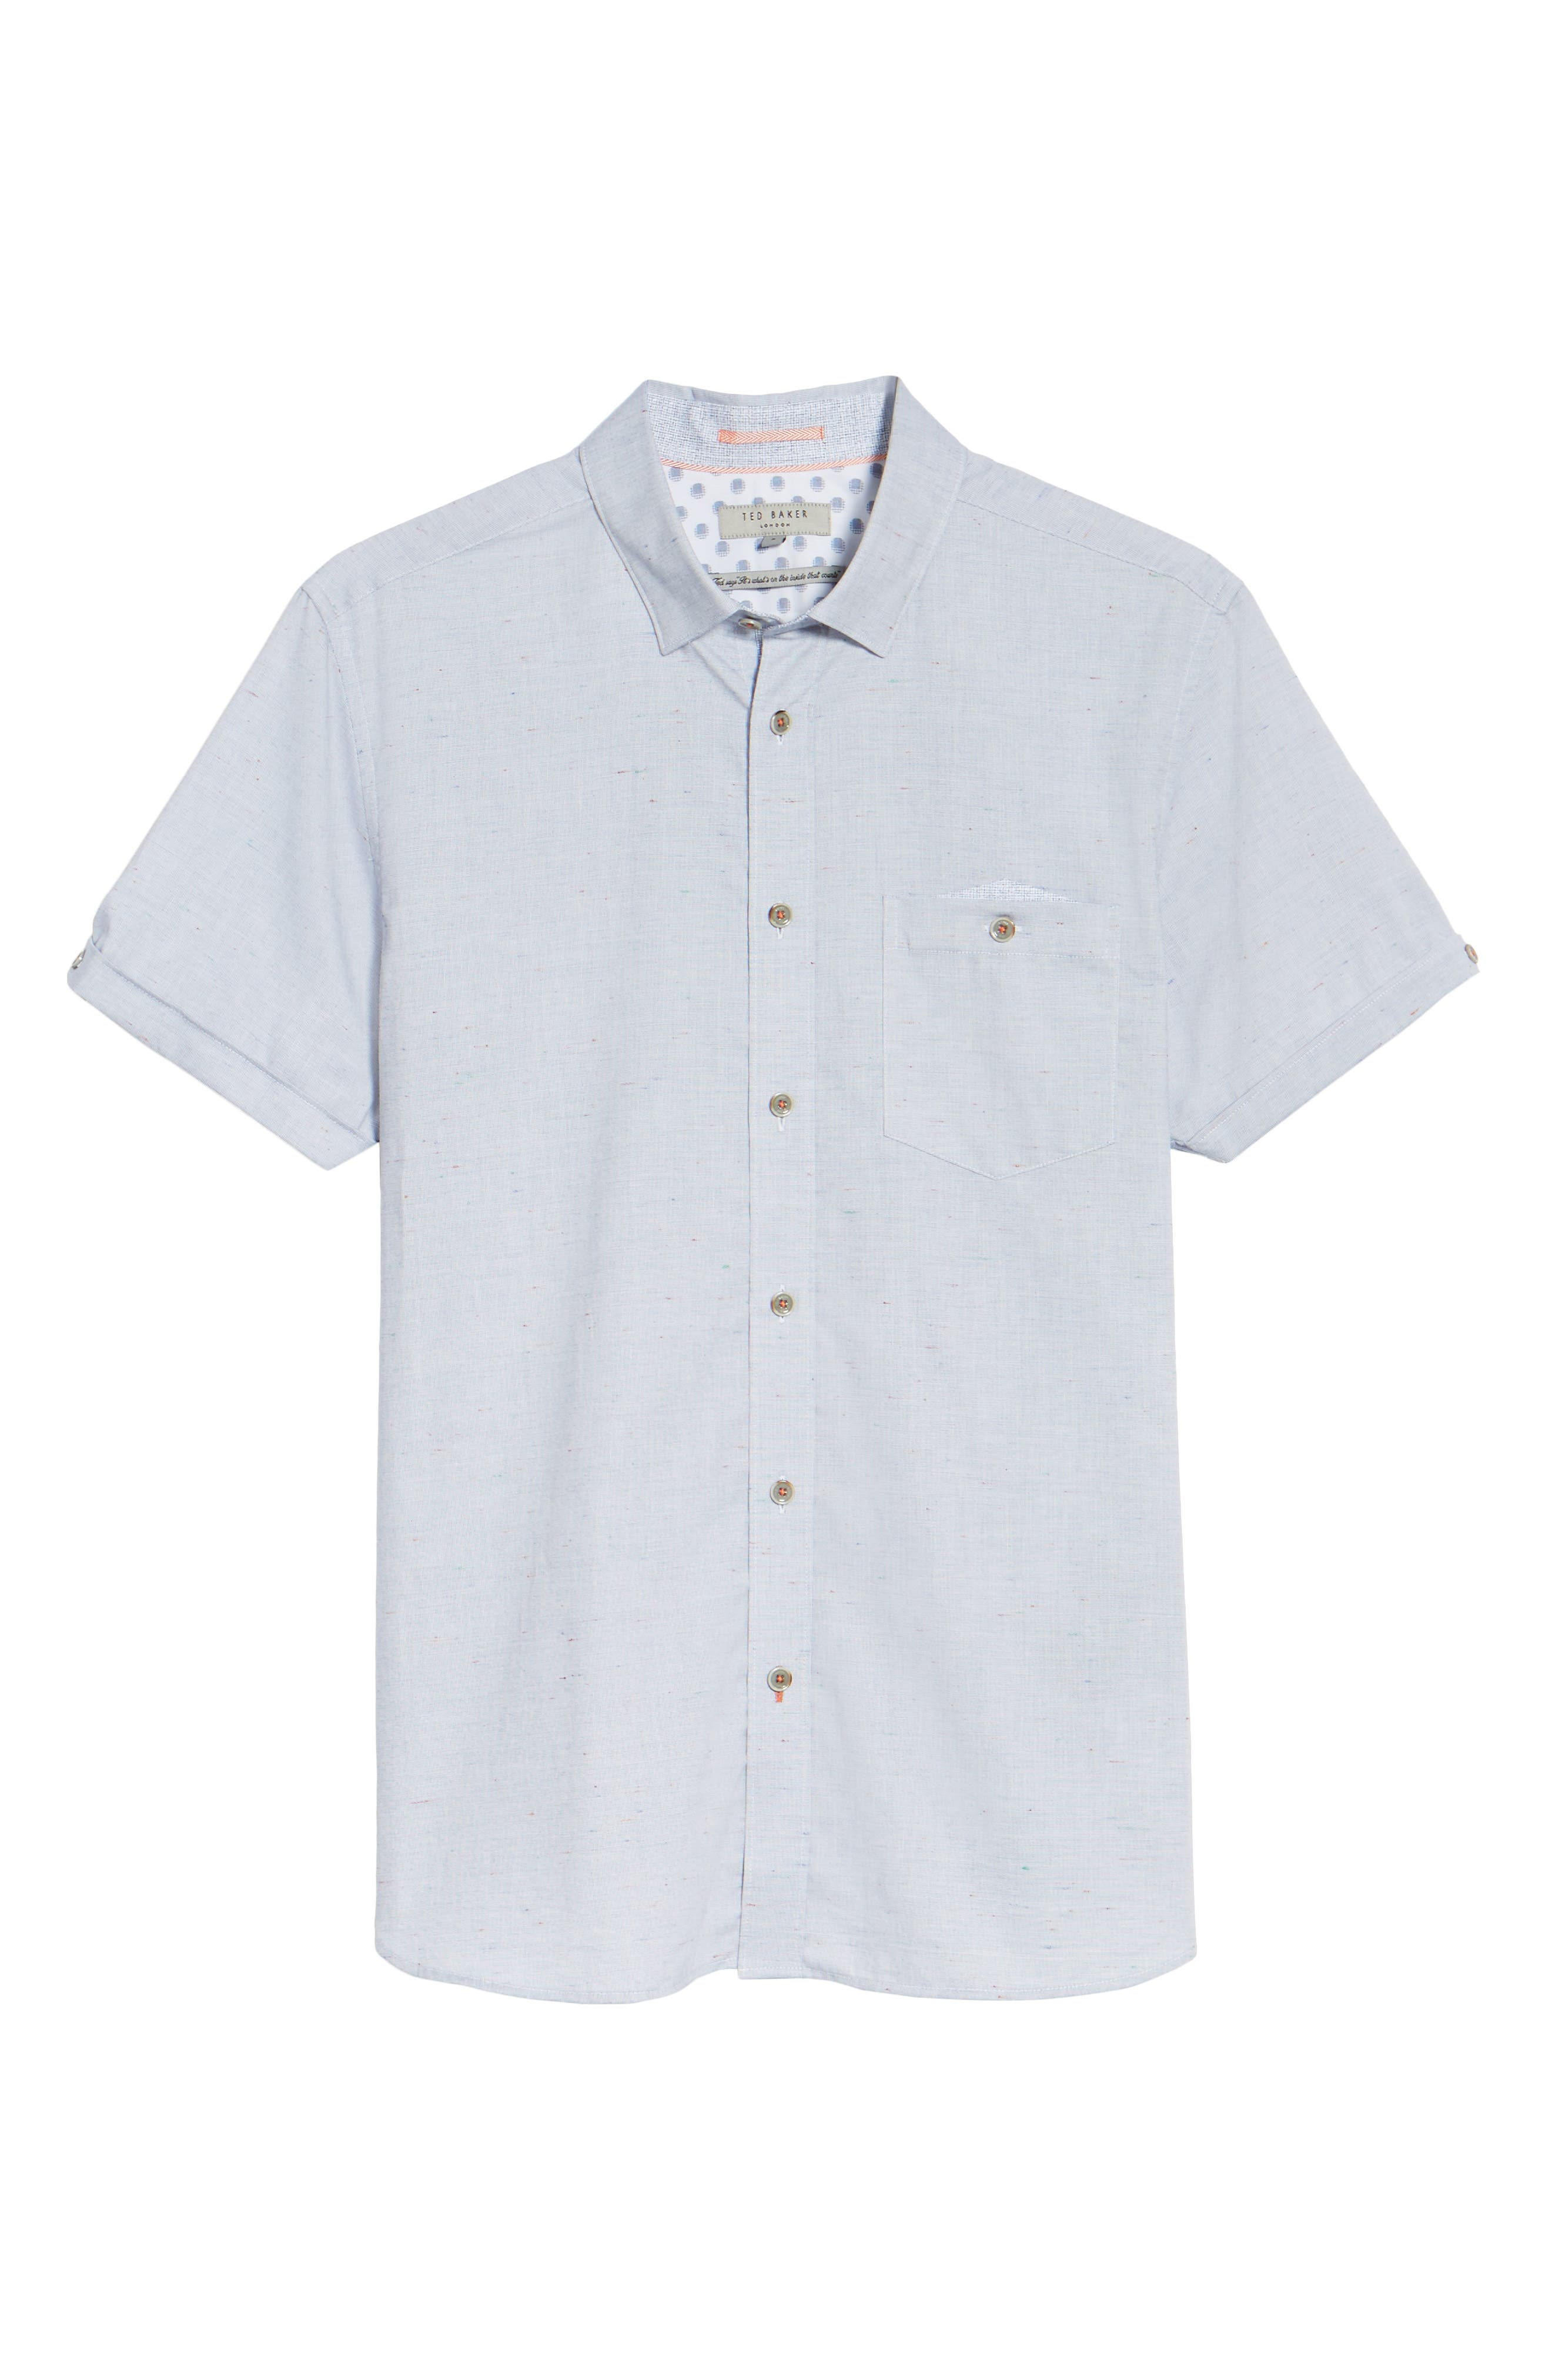 Beya Slim Fit Nepped Woven Shirt,                             Alternate thumbnail 6, color,                             421